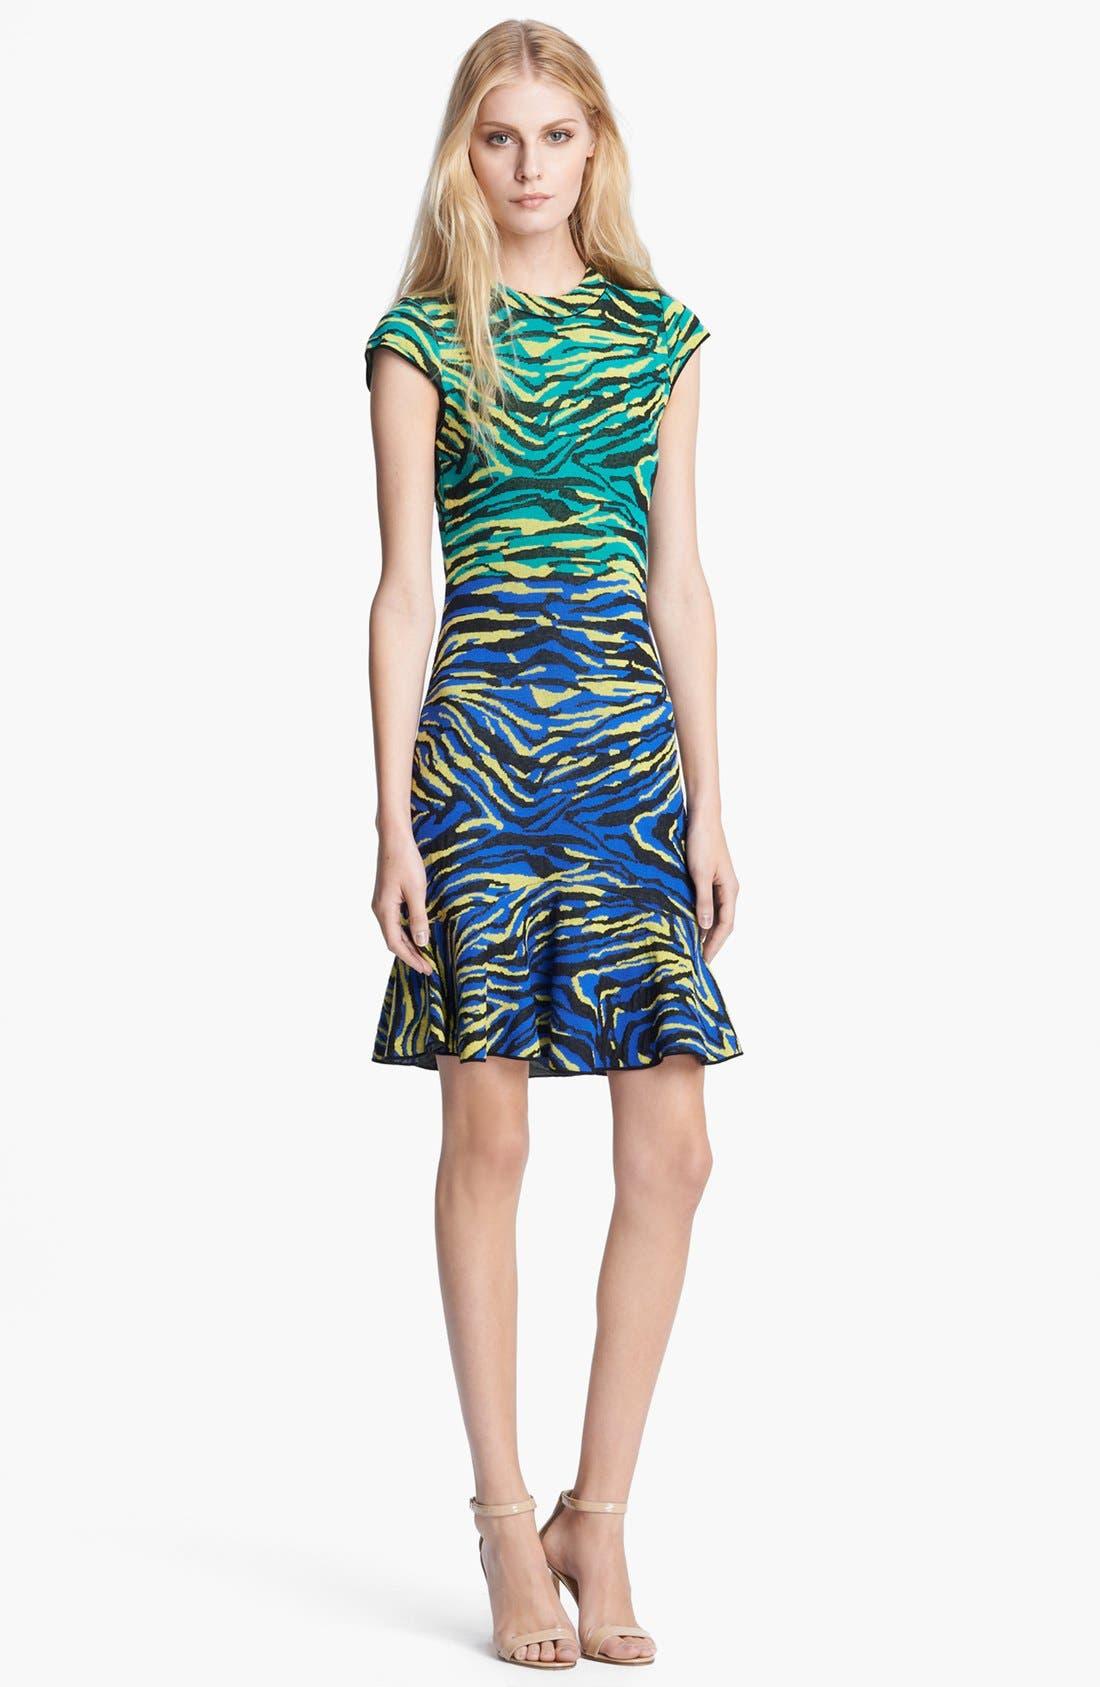 Alternate Image 1 Selected - M Missoni Zebra Jacquard Dress